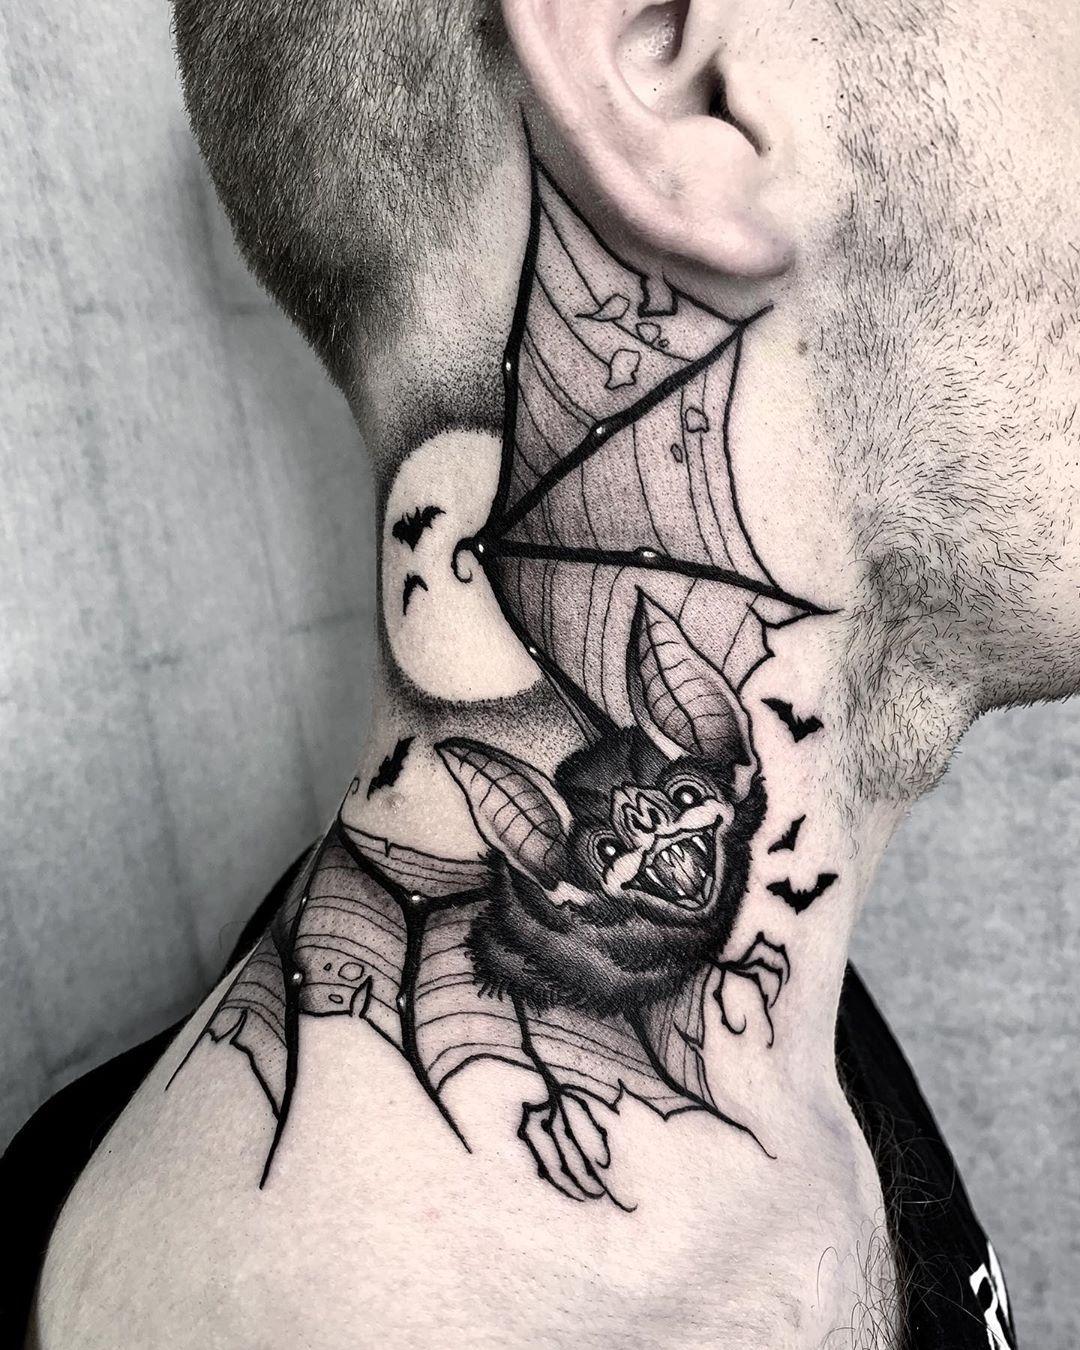 angeloparente in 2020 | Geometric throat tattoo, Halloween tattoos, Throat tattoo